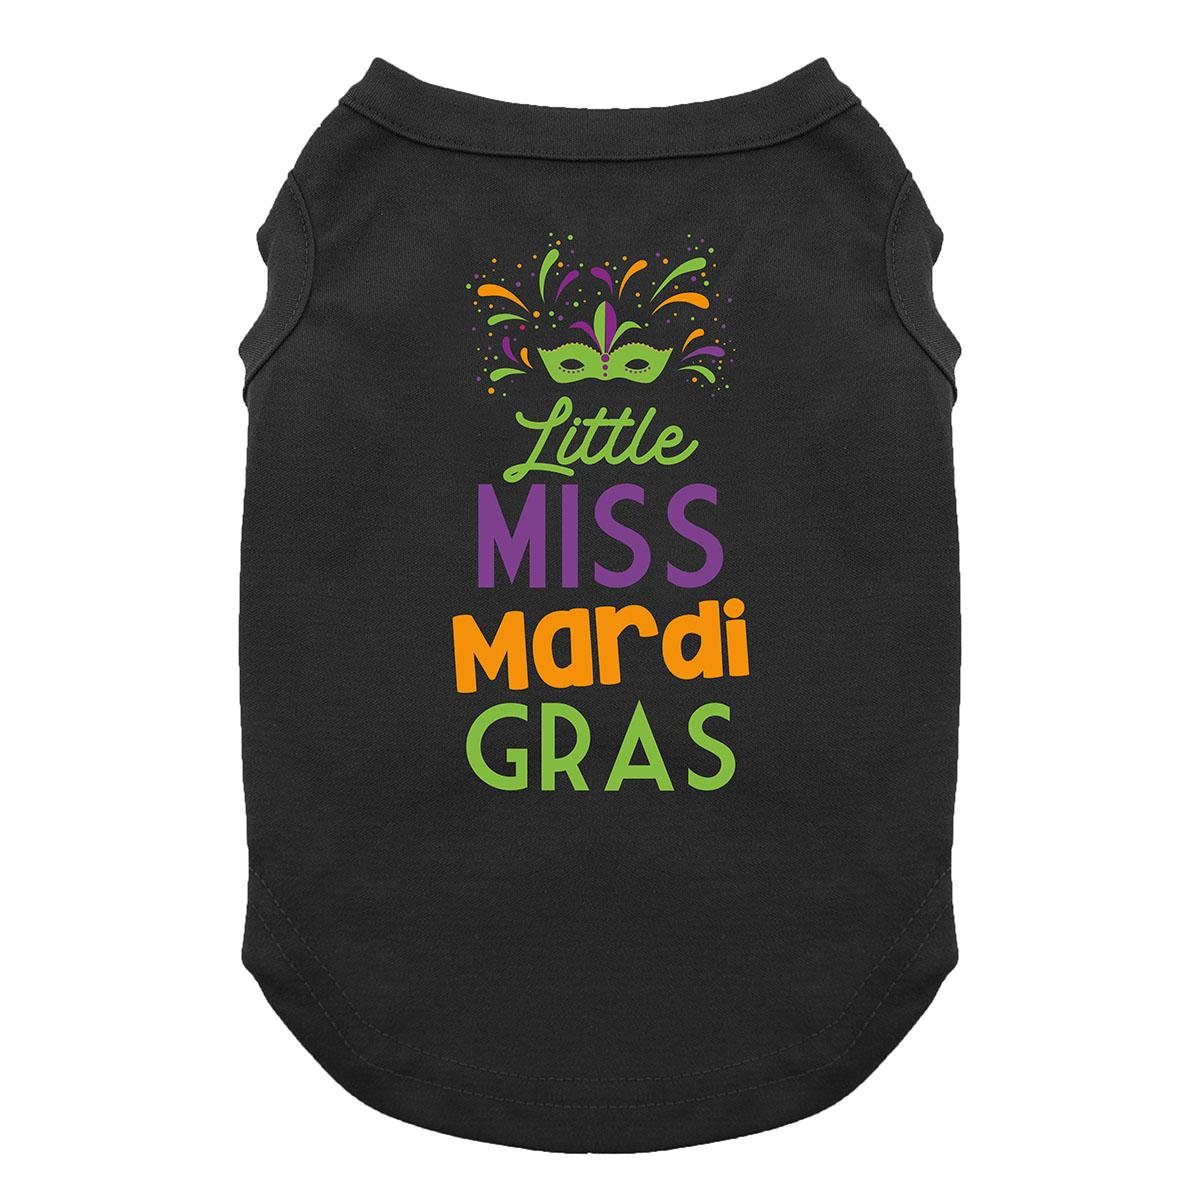 Little Miss Mardi Gras Dog Shirt - Black